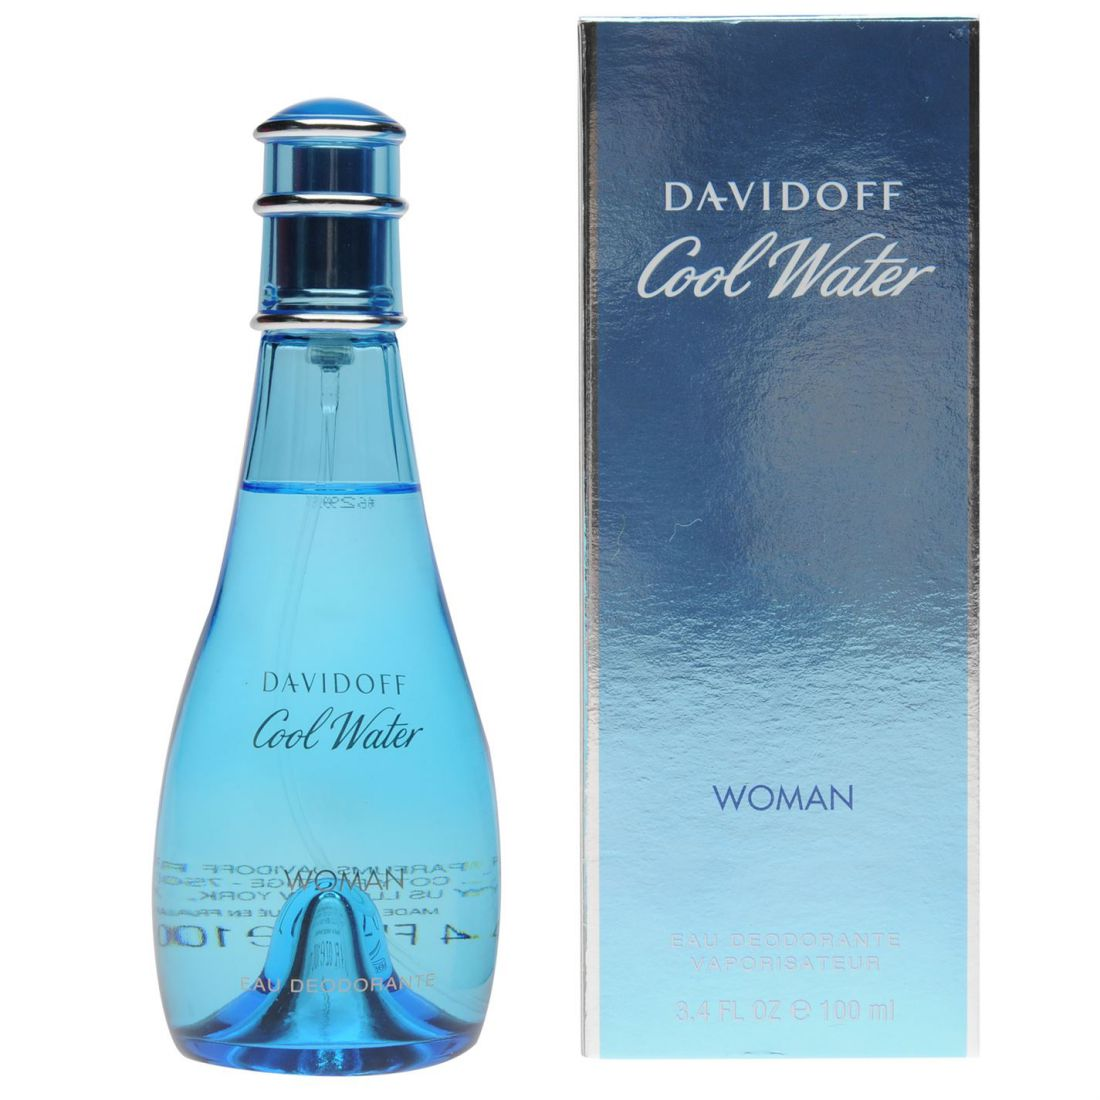 2920eaf6a3 Davidoff Womens Cool Water Deodorant Spray 100ml for sale online   eBay